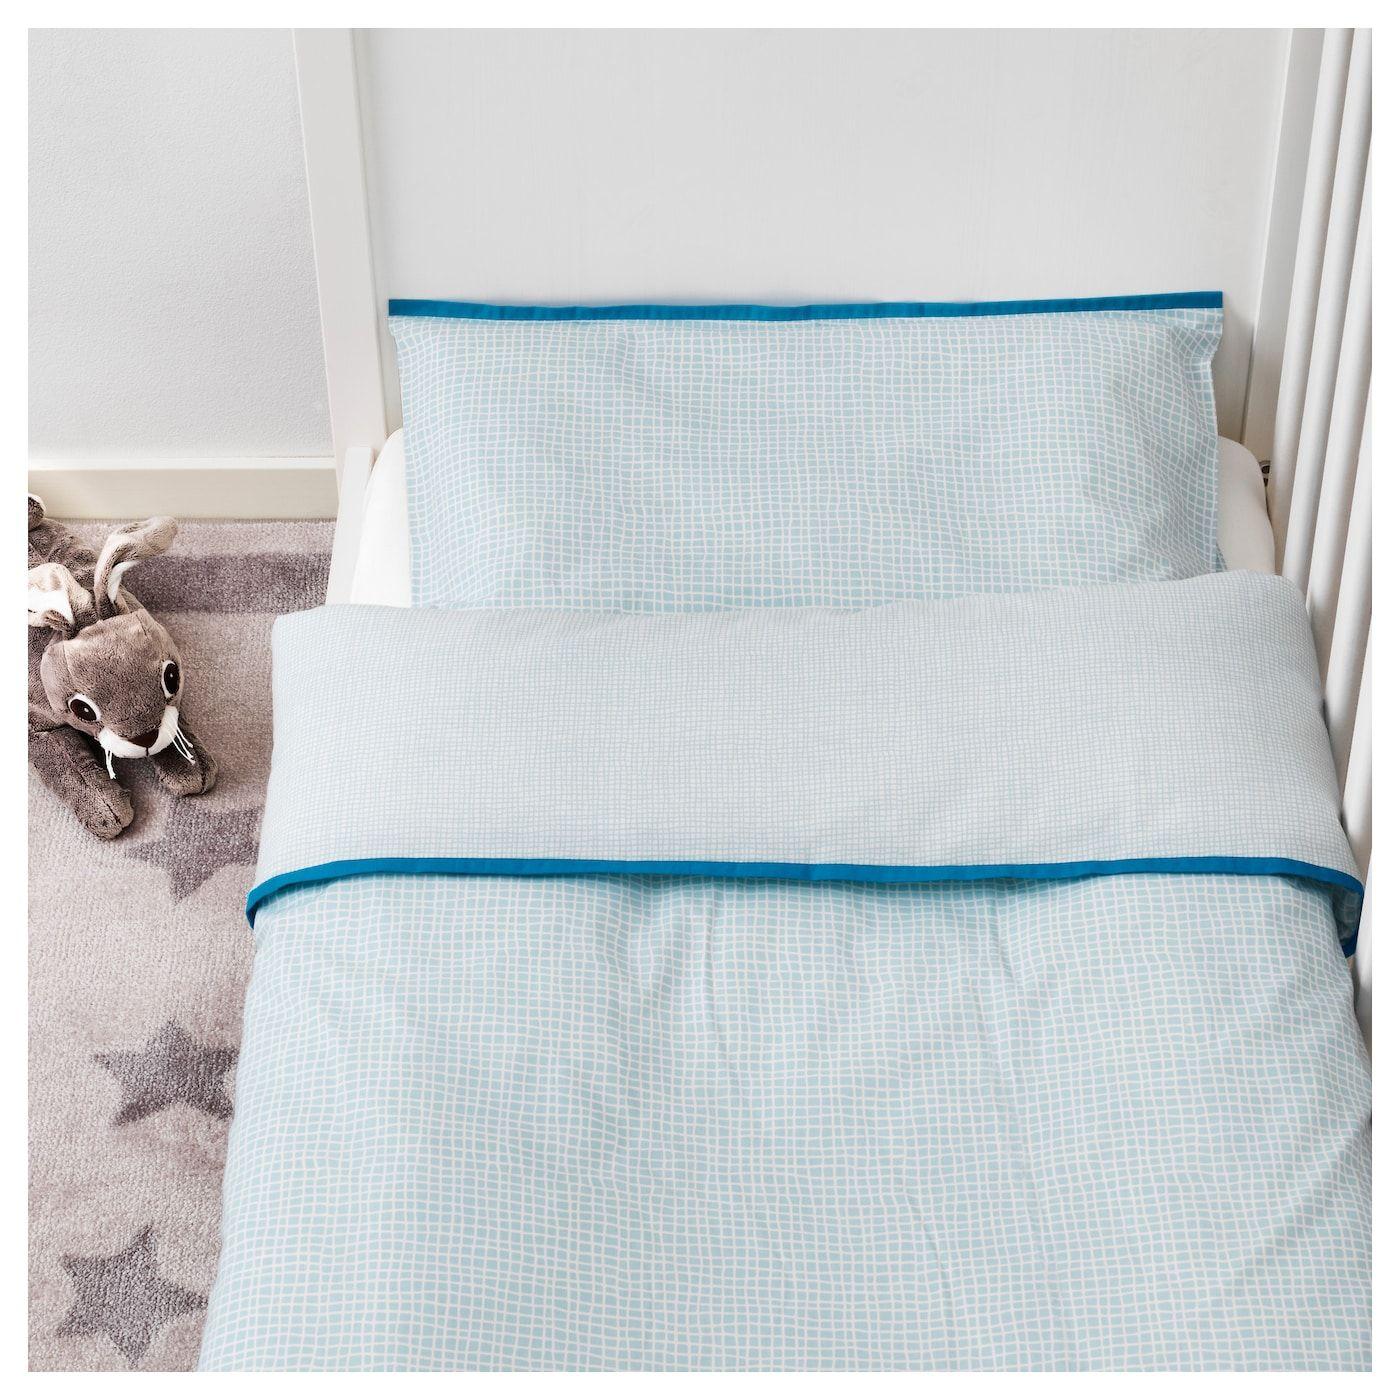 Ikea Klammig Crib Duvet Cover Pillowcase Turquoise Pillow